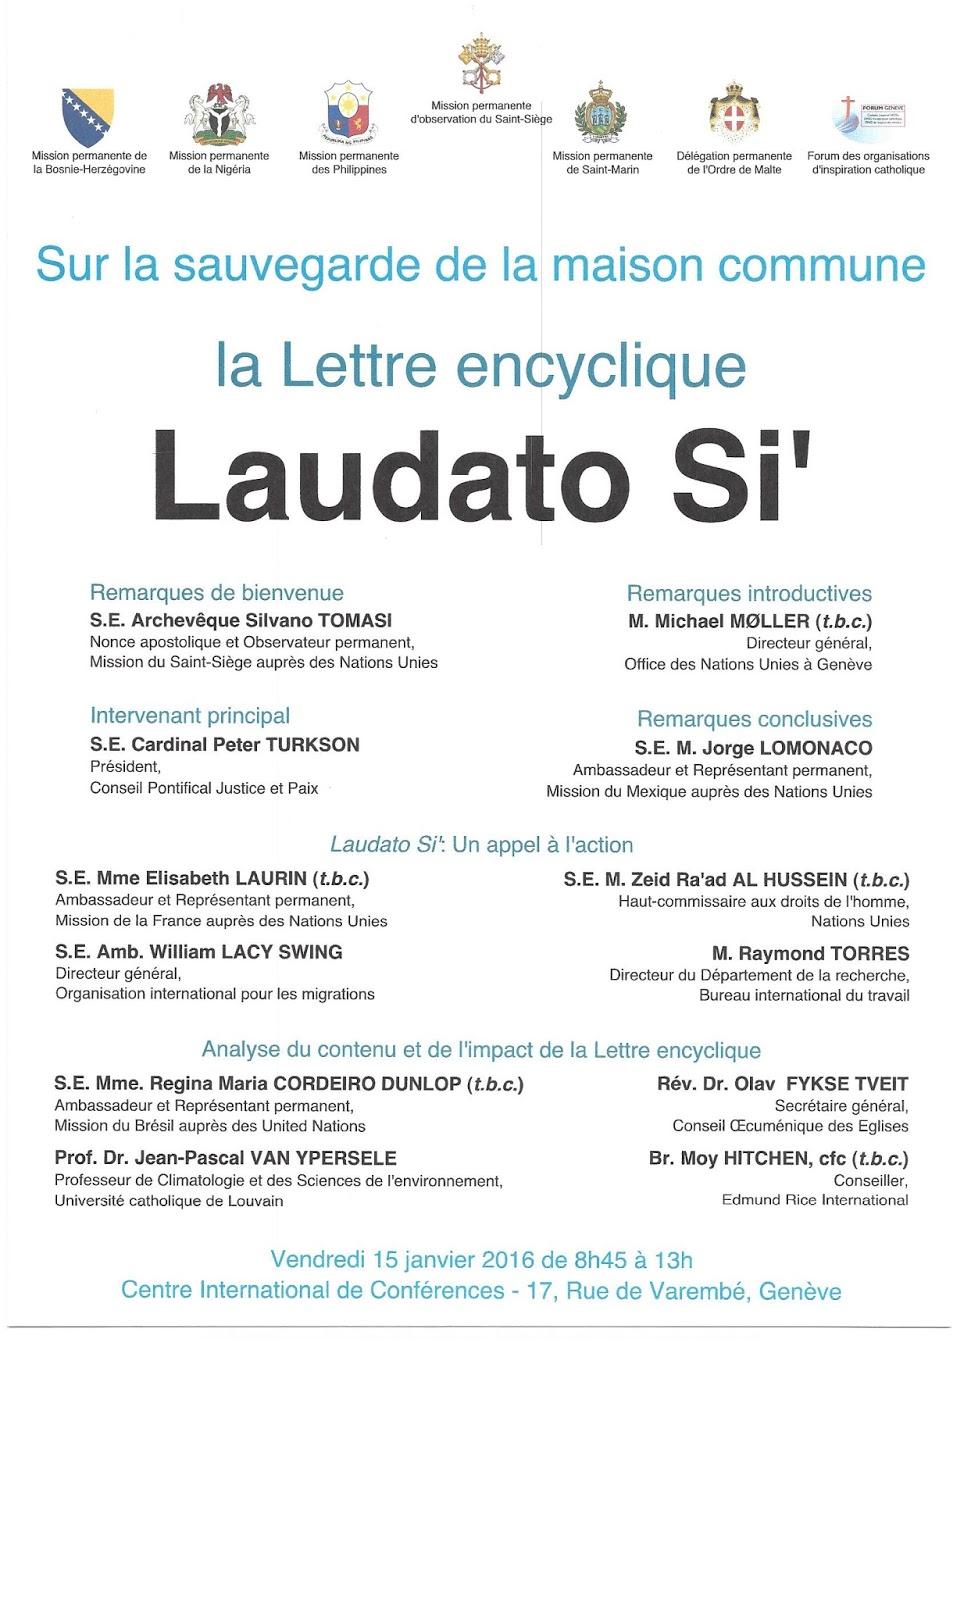 Invitation, Geneva, 15.01.2016